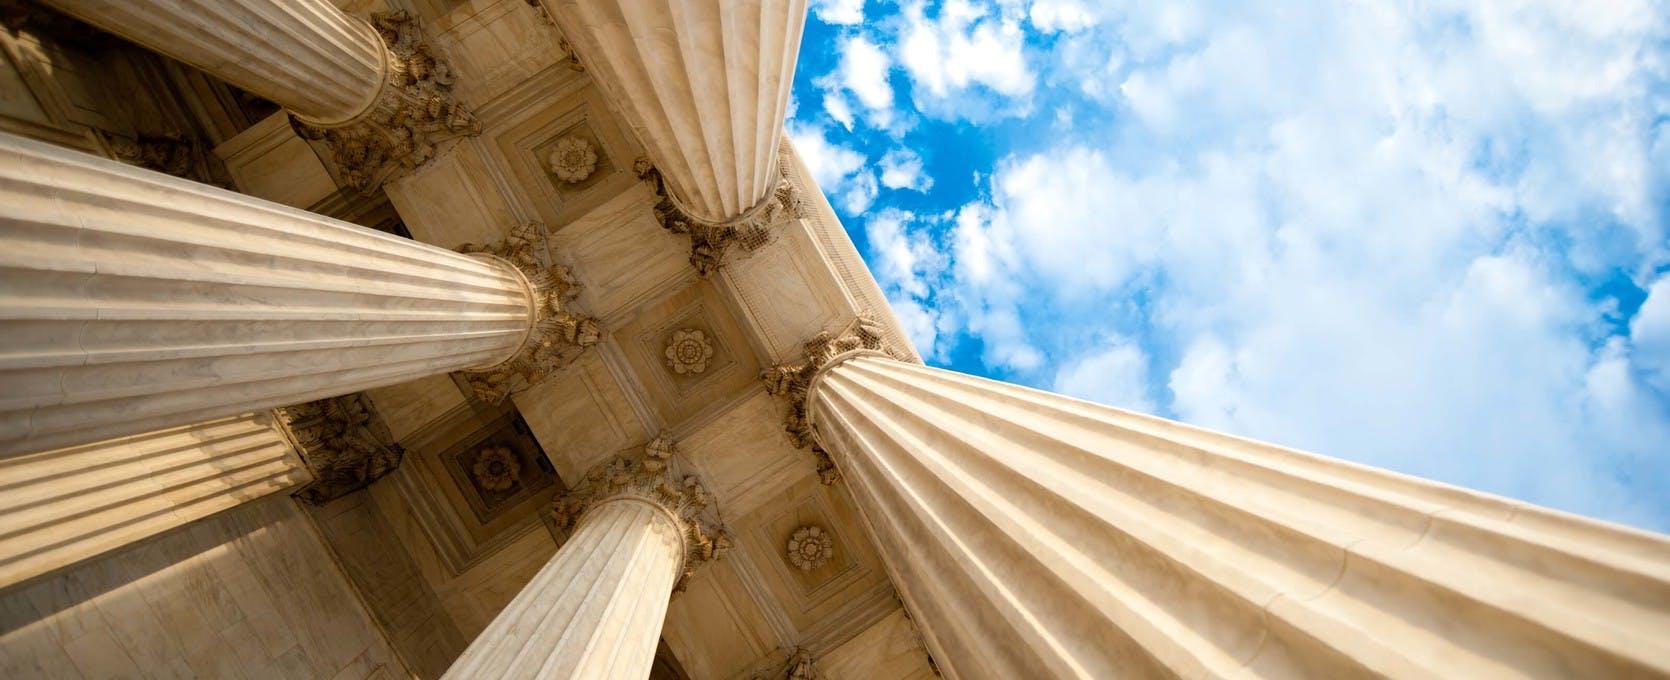 Government building columns, architecture